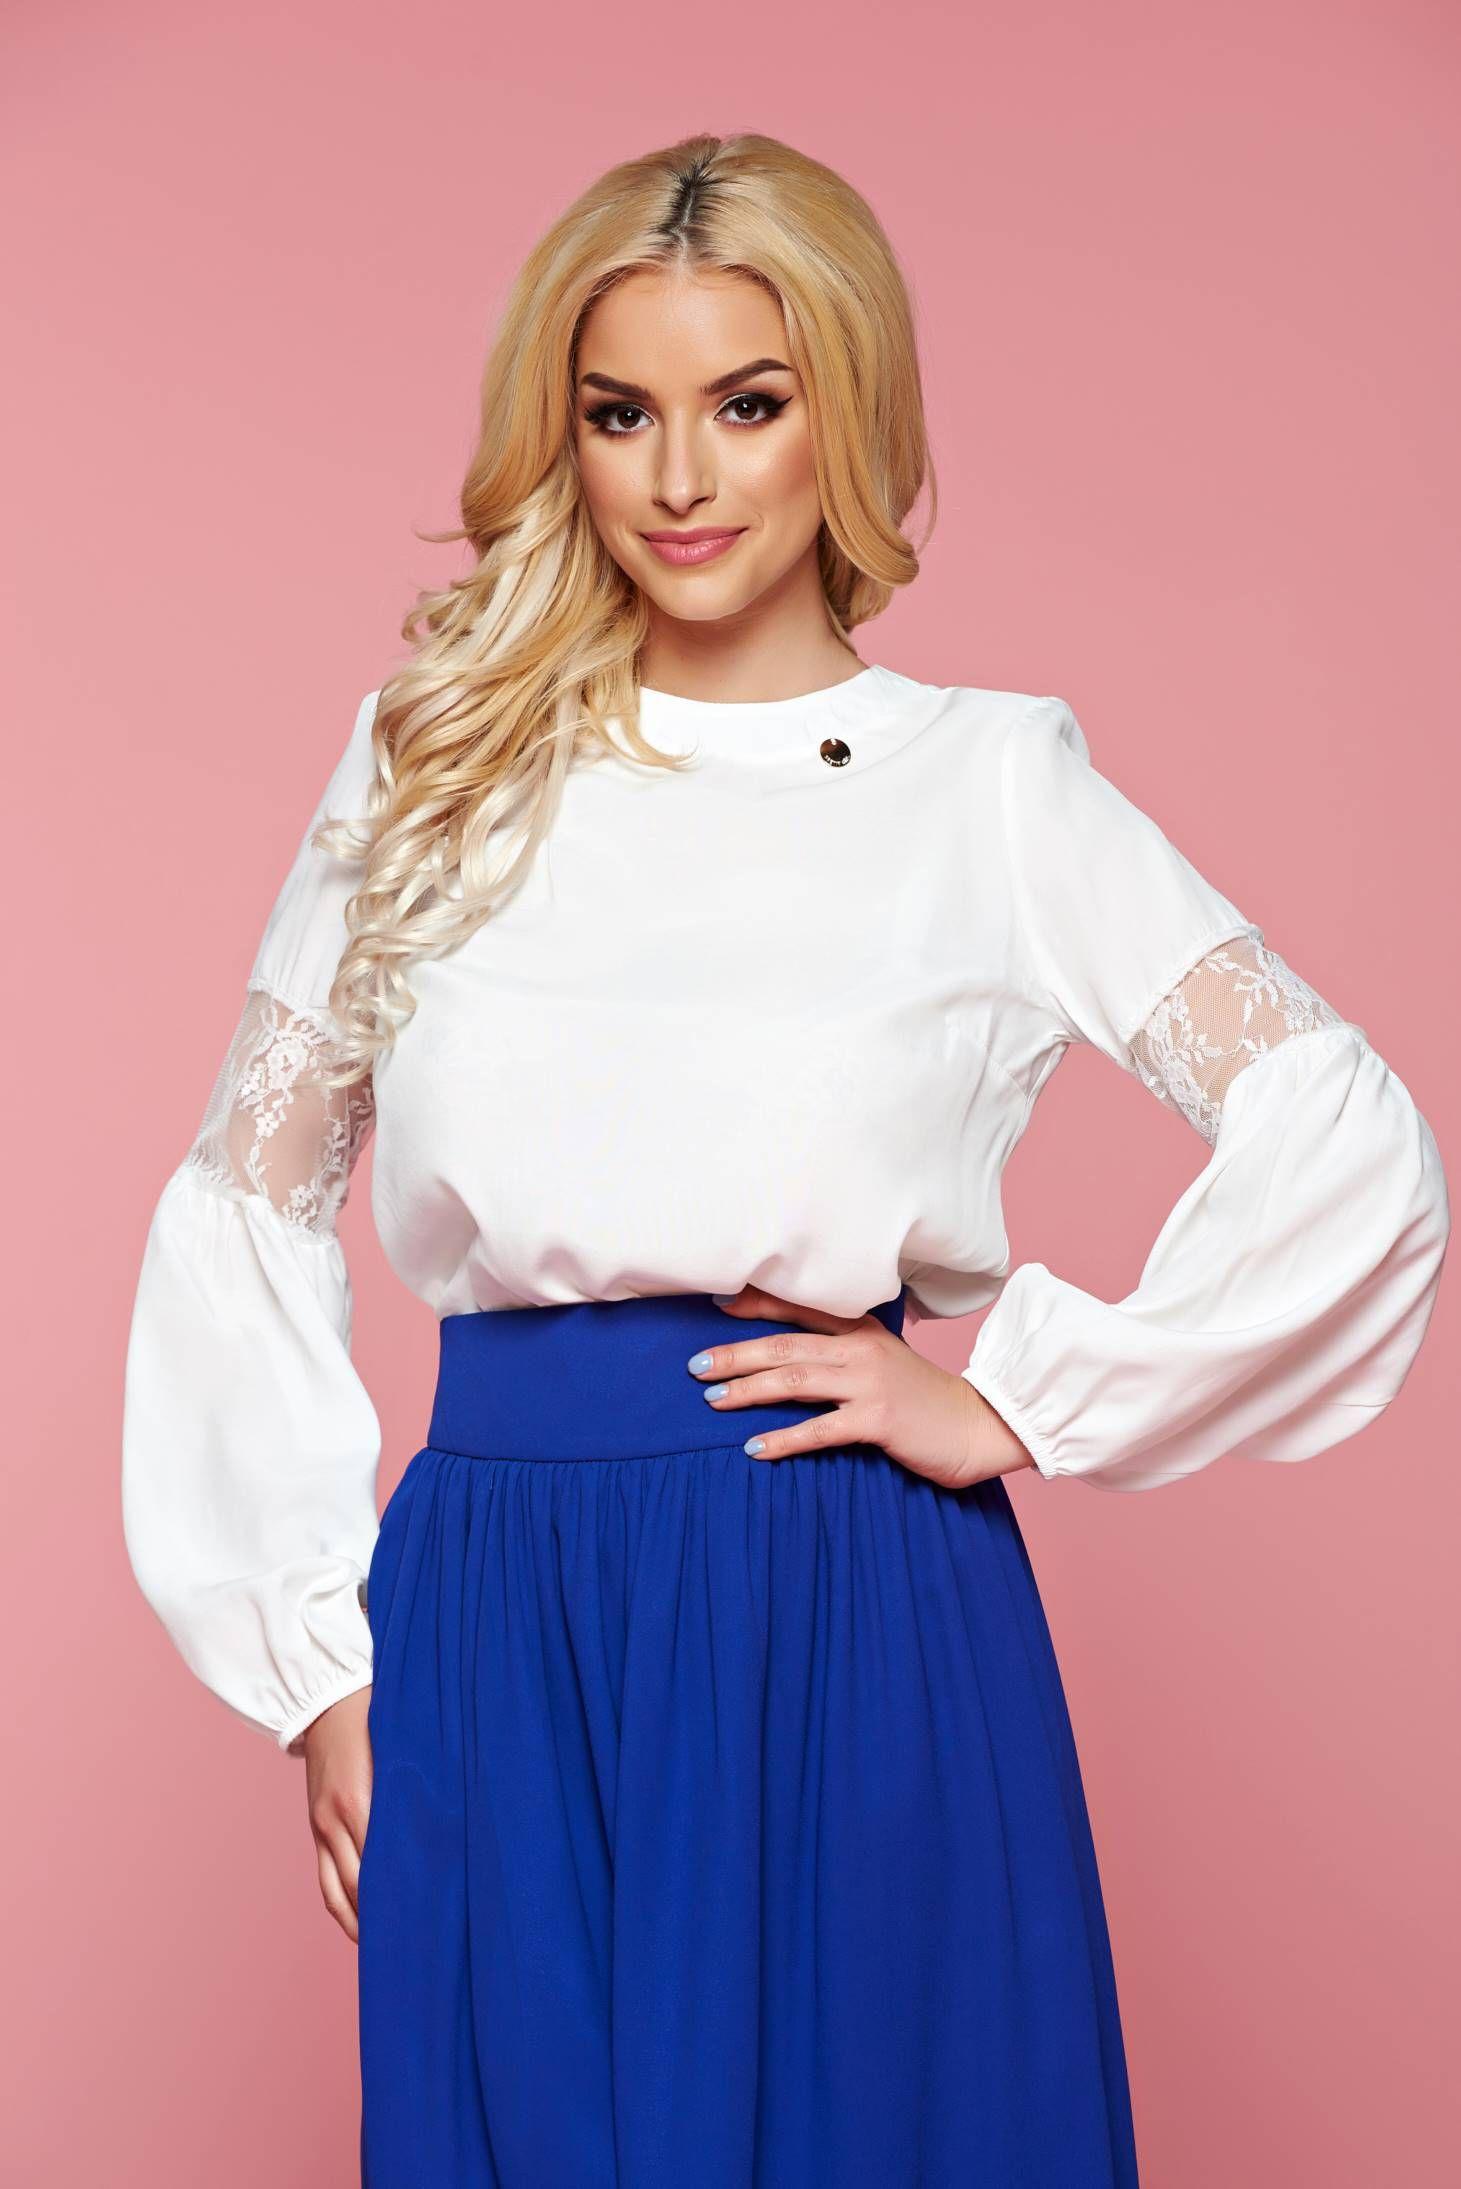 Comanda online, Bluza dama cu maneca lunga PrettyGirl alba cu aplicatii de dantela. Articole masurate, calitate garantata!